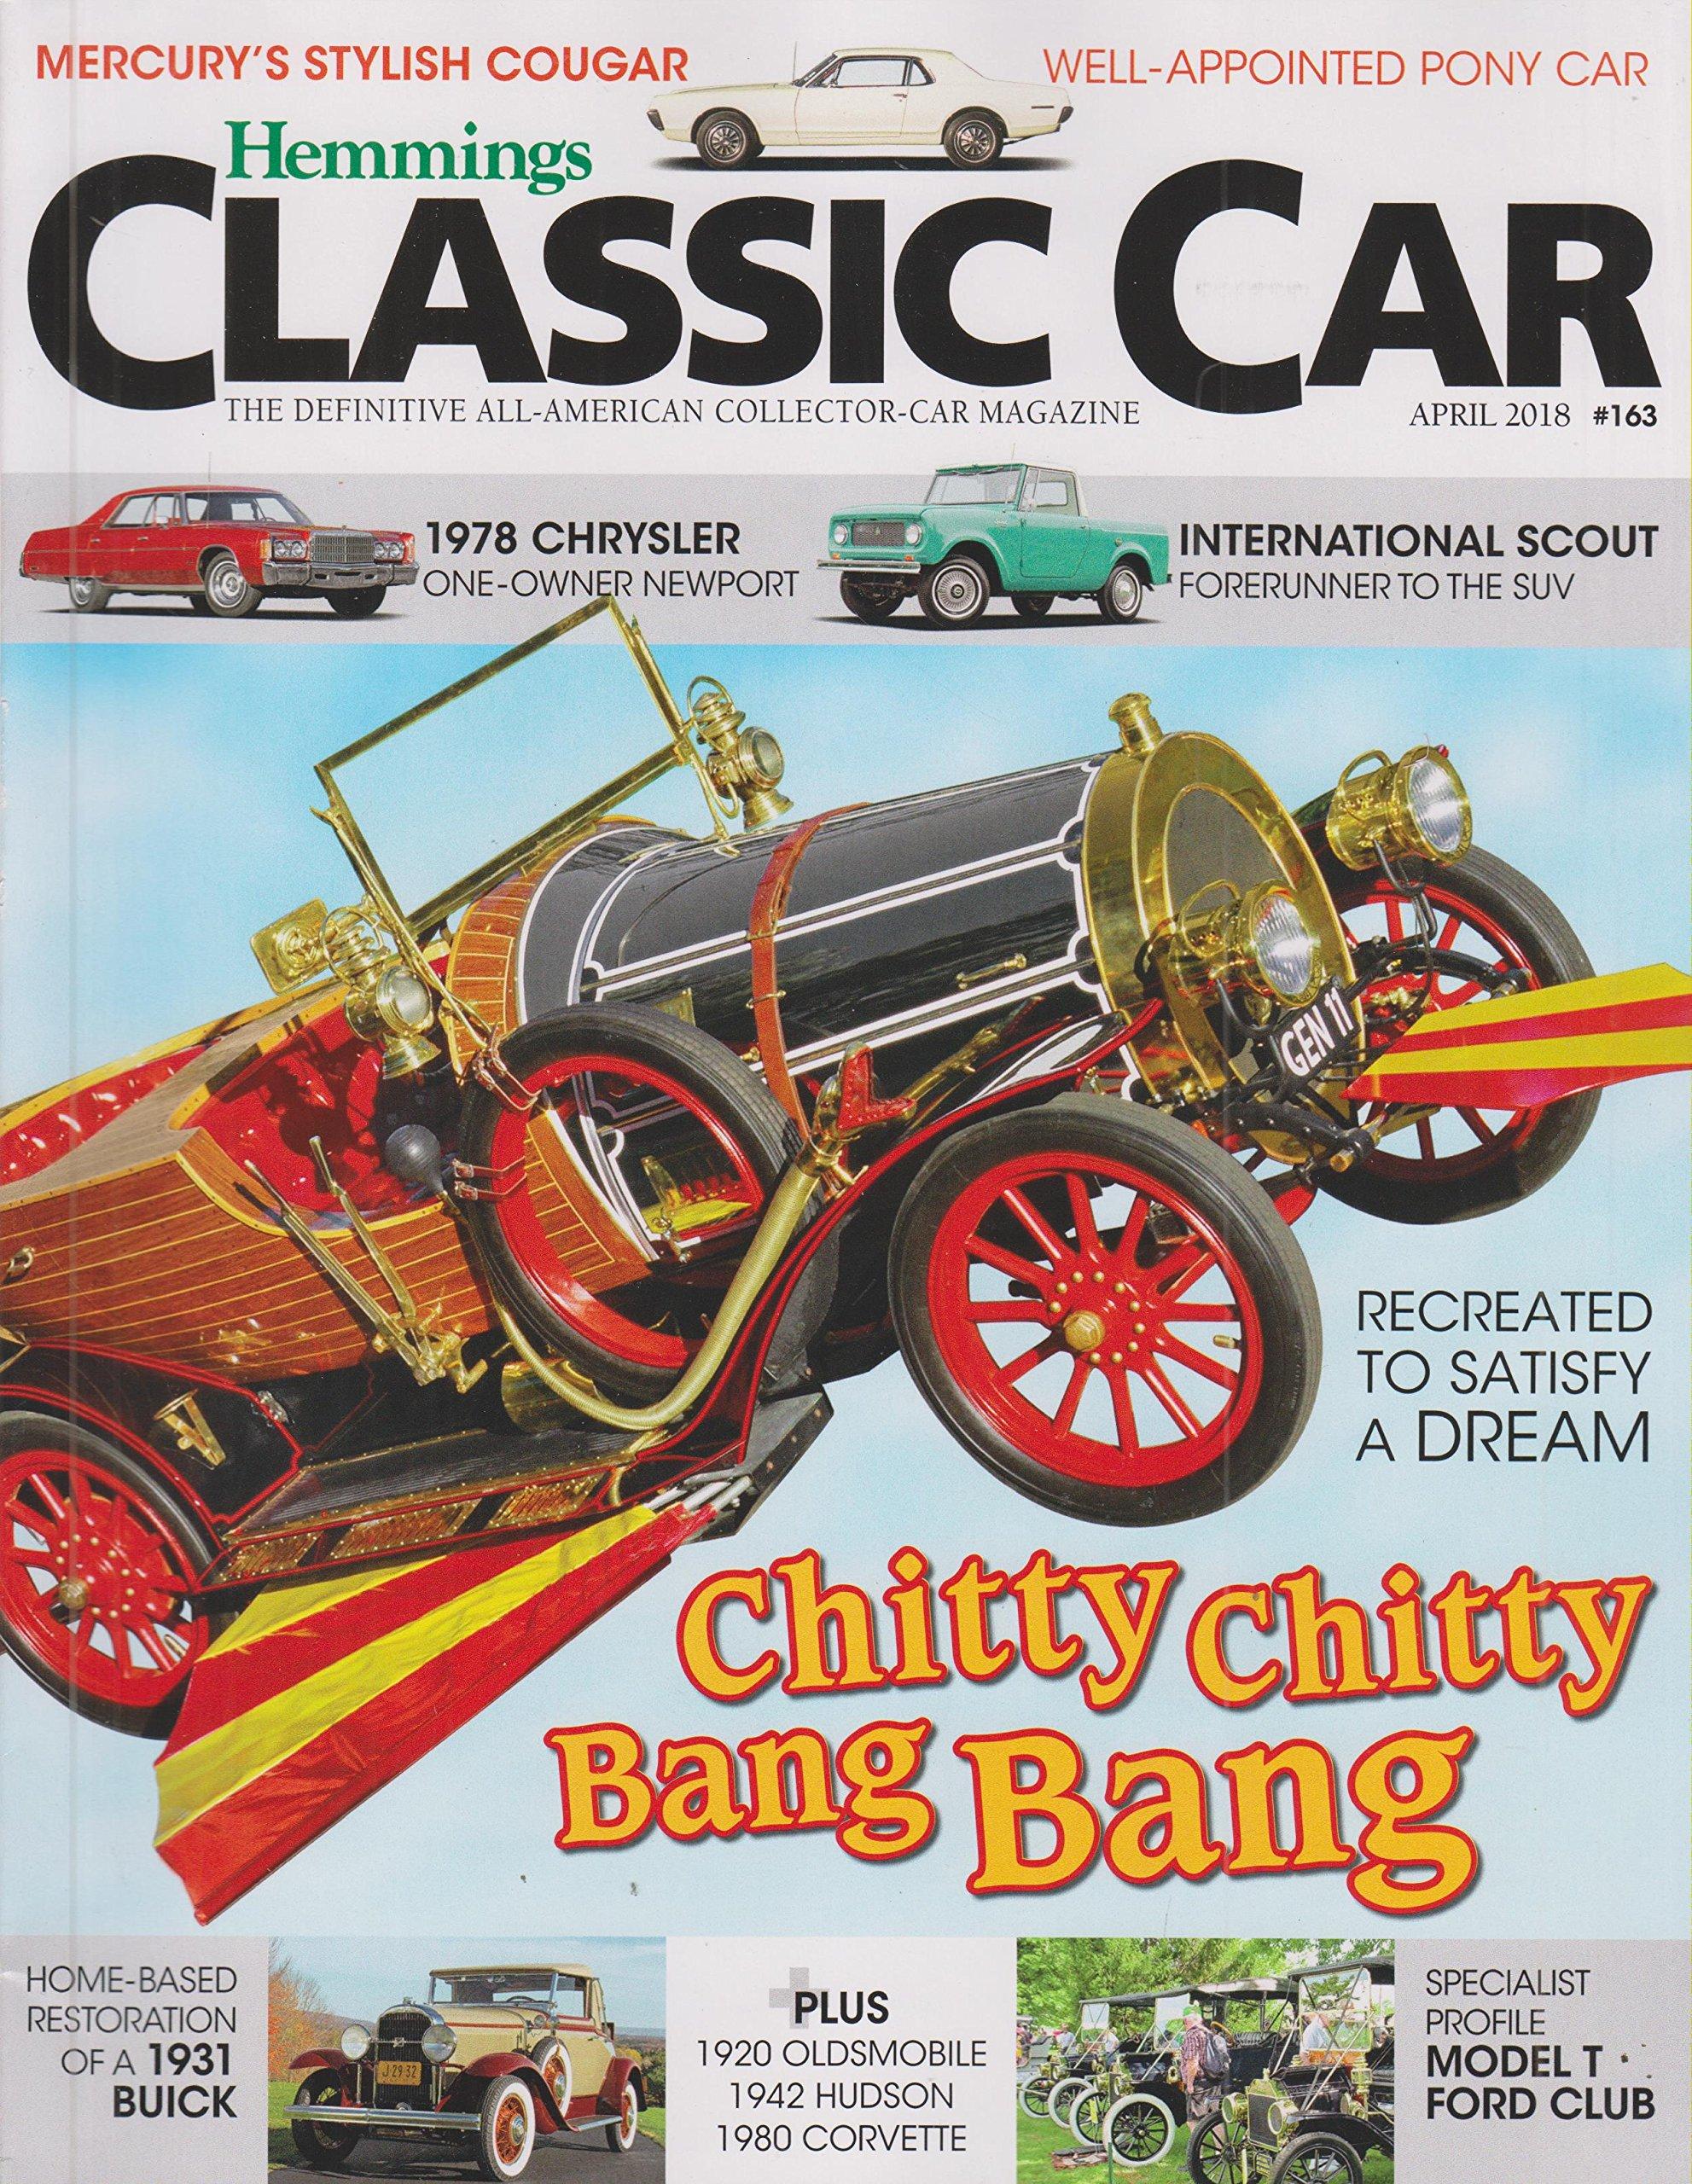 Hemmings Classic Car April 2018 Chitty Chitty Bang Bang - Recreated ...